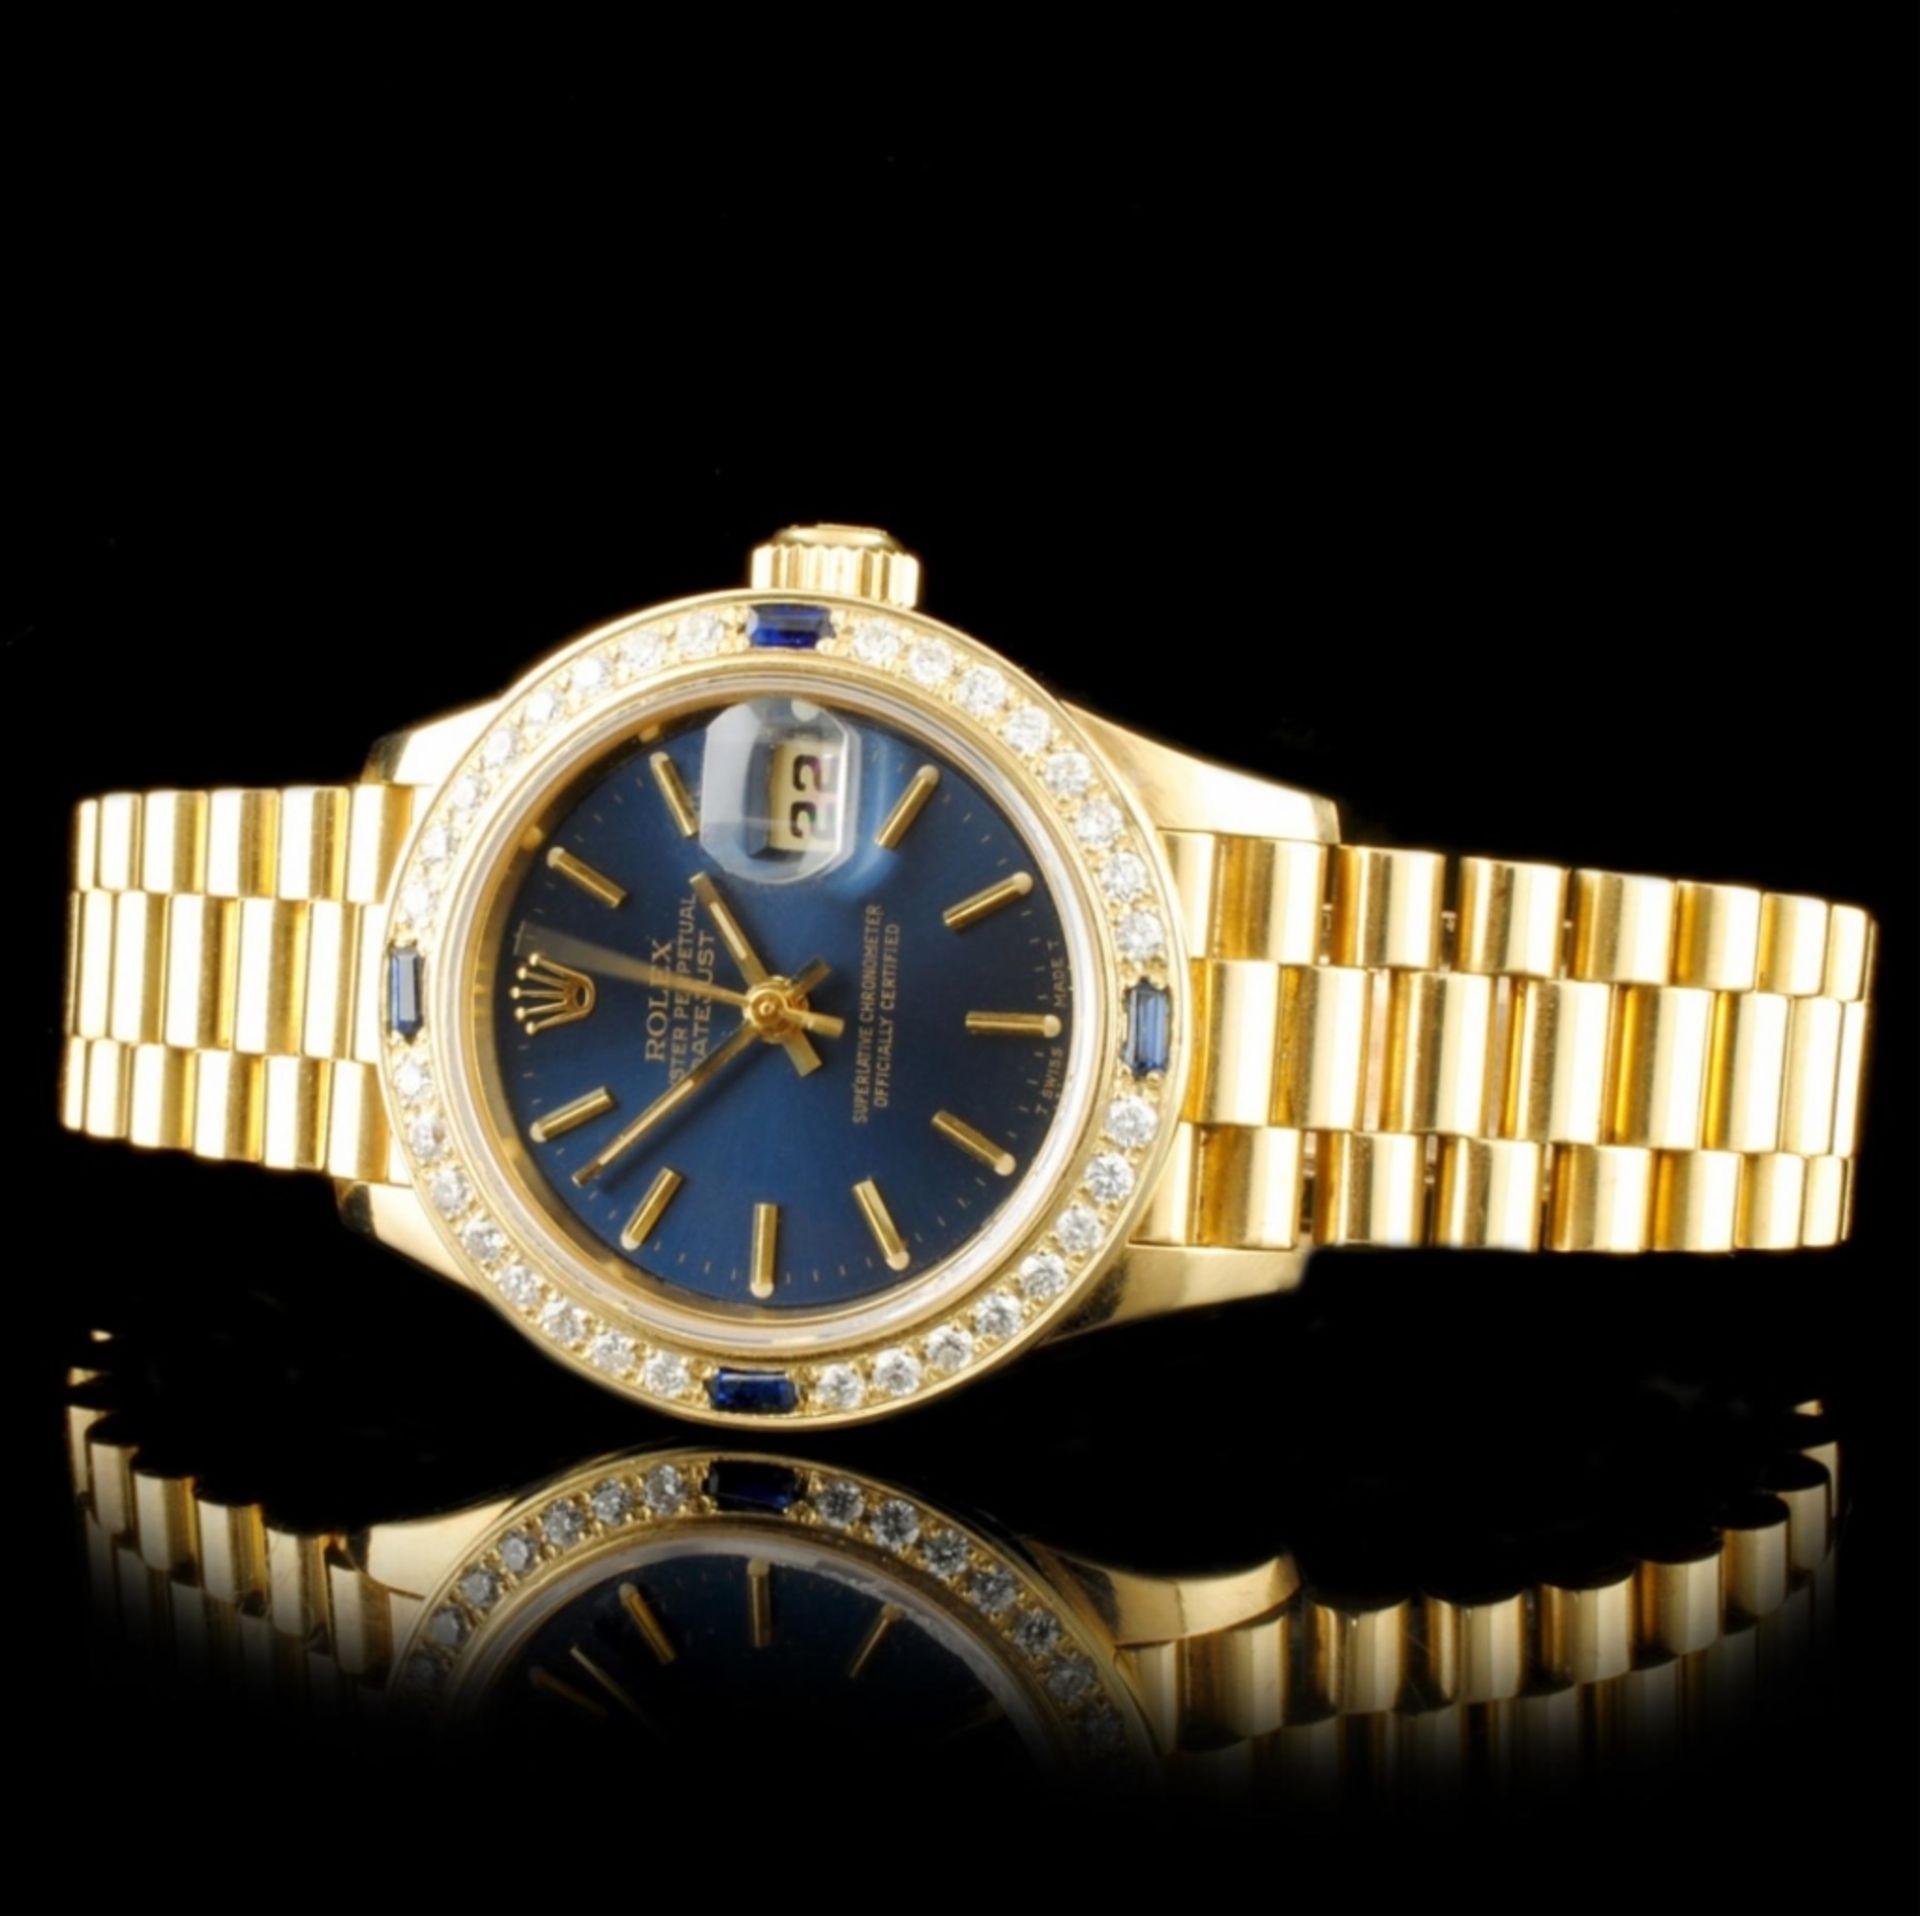 Rolex DateJust 18K YG Diamond 26MM Watch - Image 2 of 6